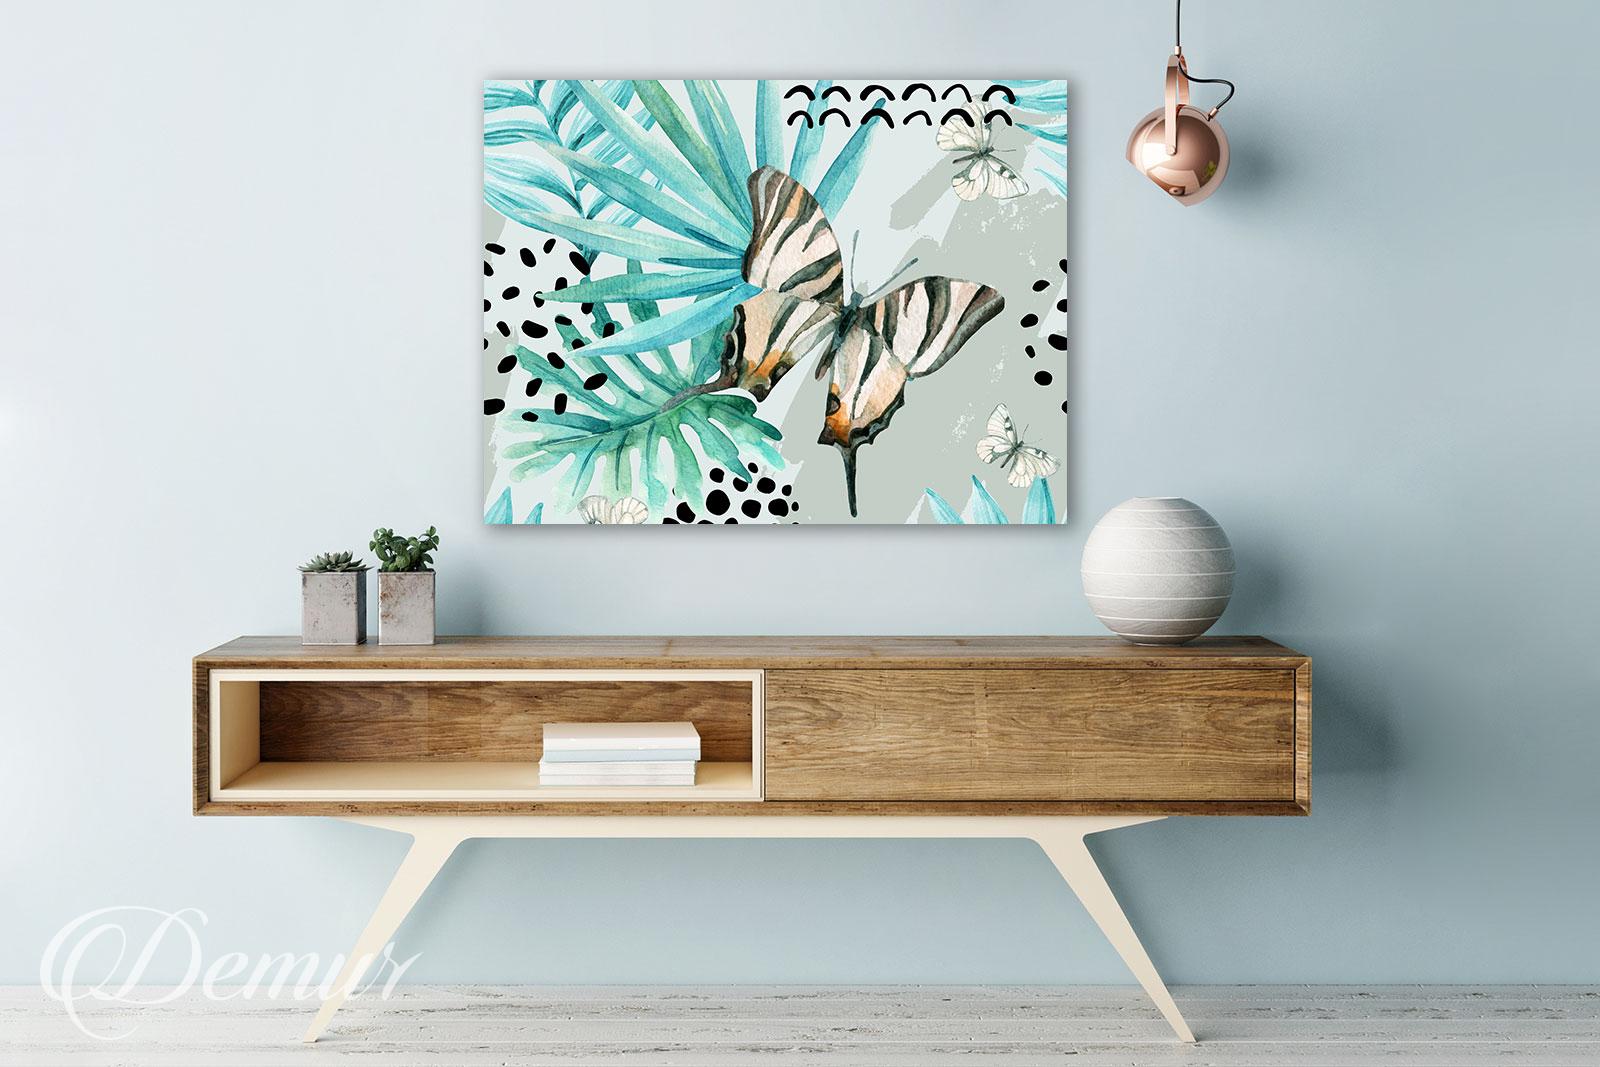 Obraz Motyl - Pomysł na ścianę - Demur